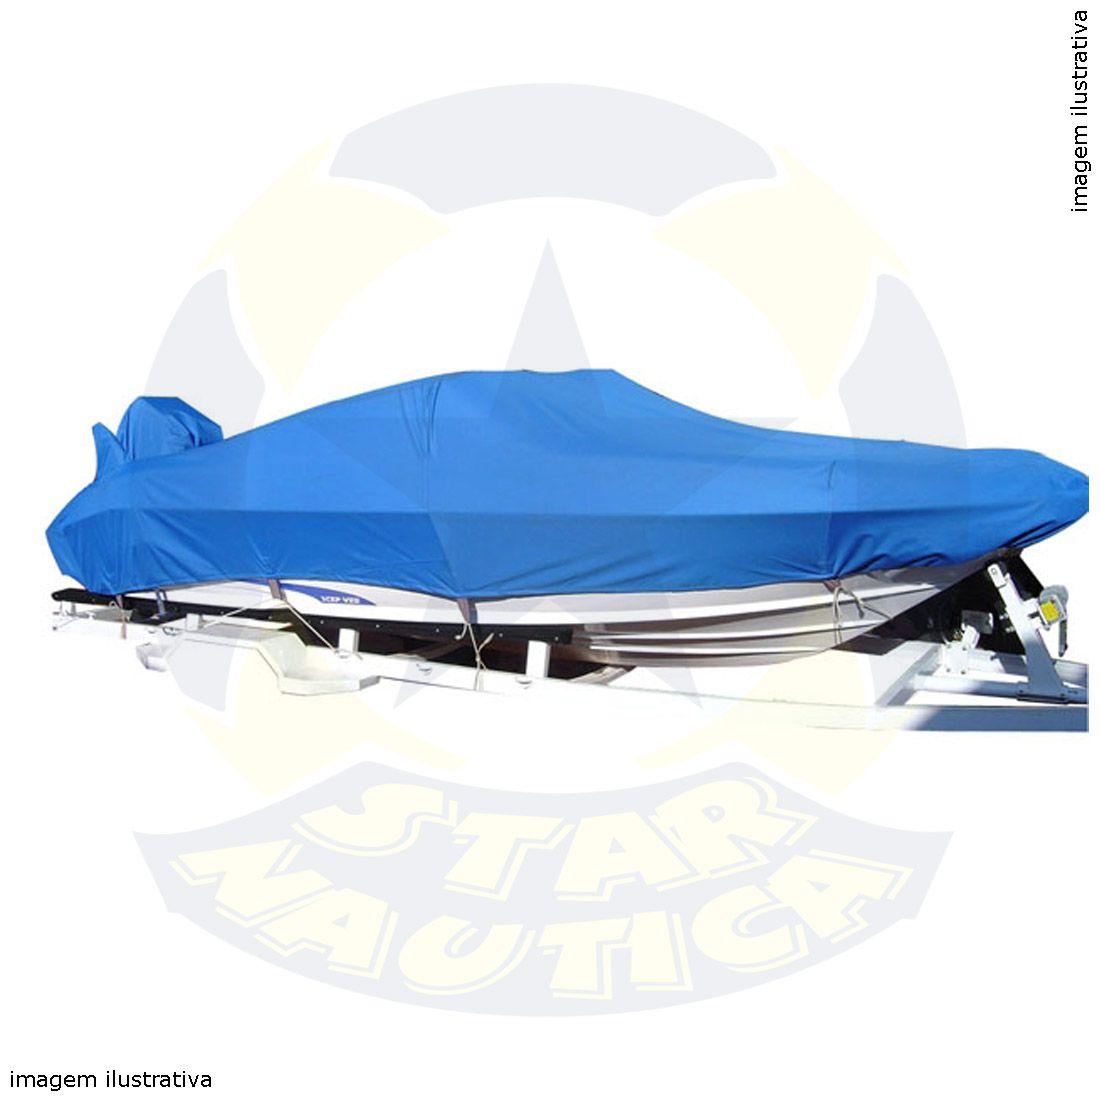 Capa Lona de Cobertura Lancha Focker 160 Lona Vinílica